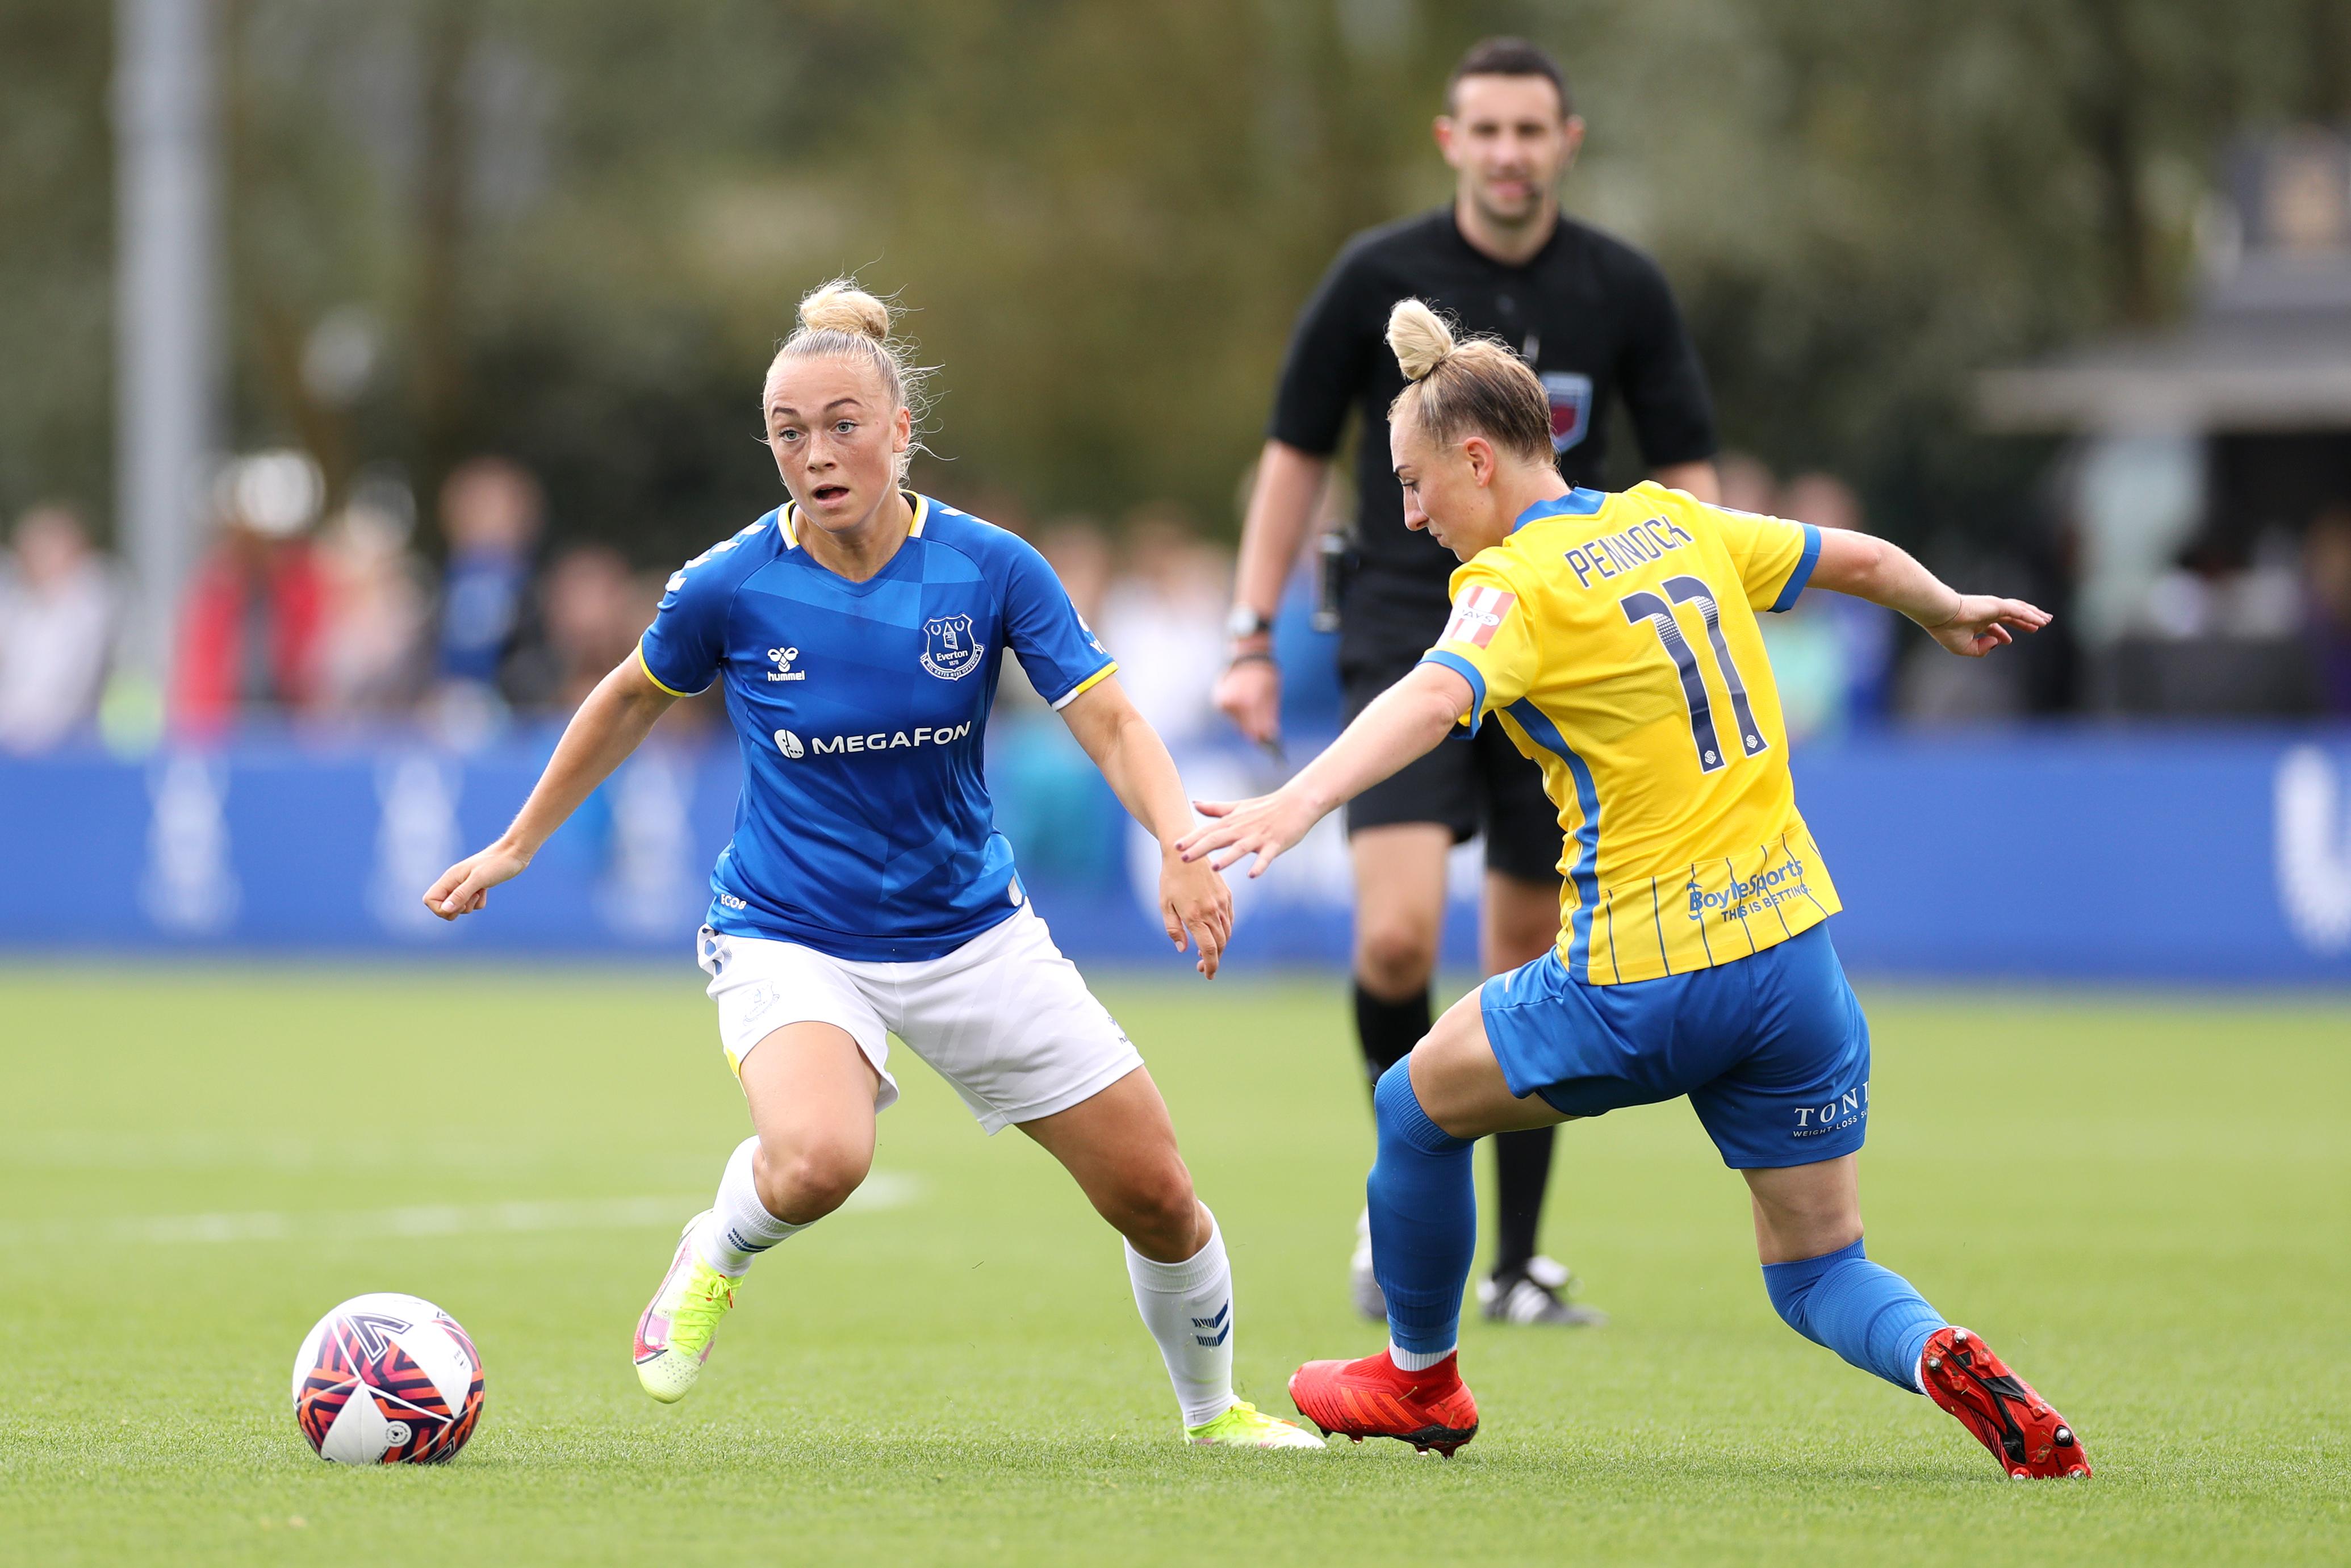 Everton Women v Birmingham City Women - Barclays FA Women's Super League